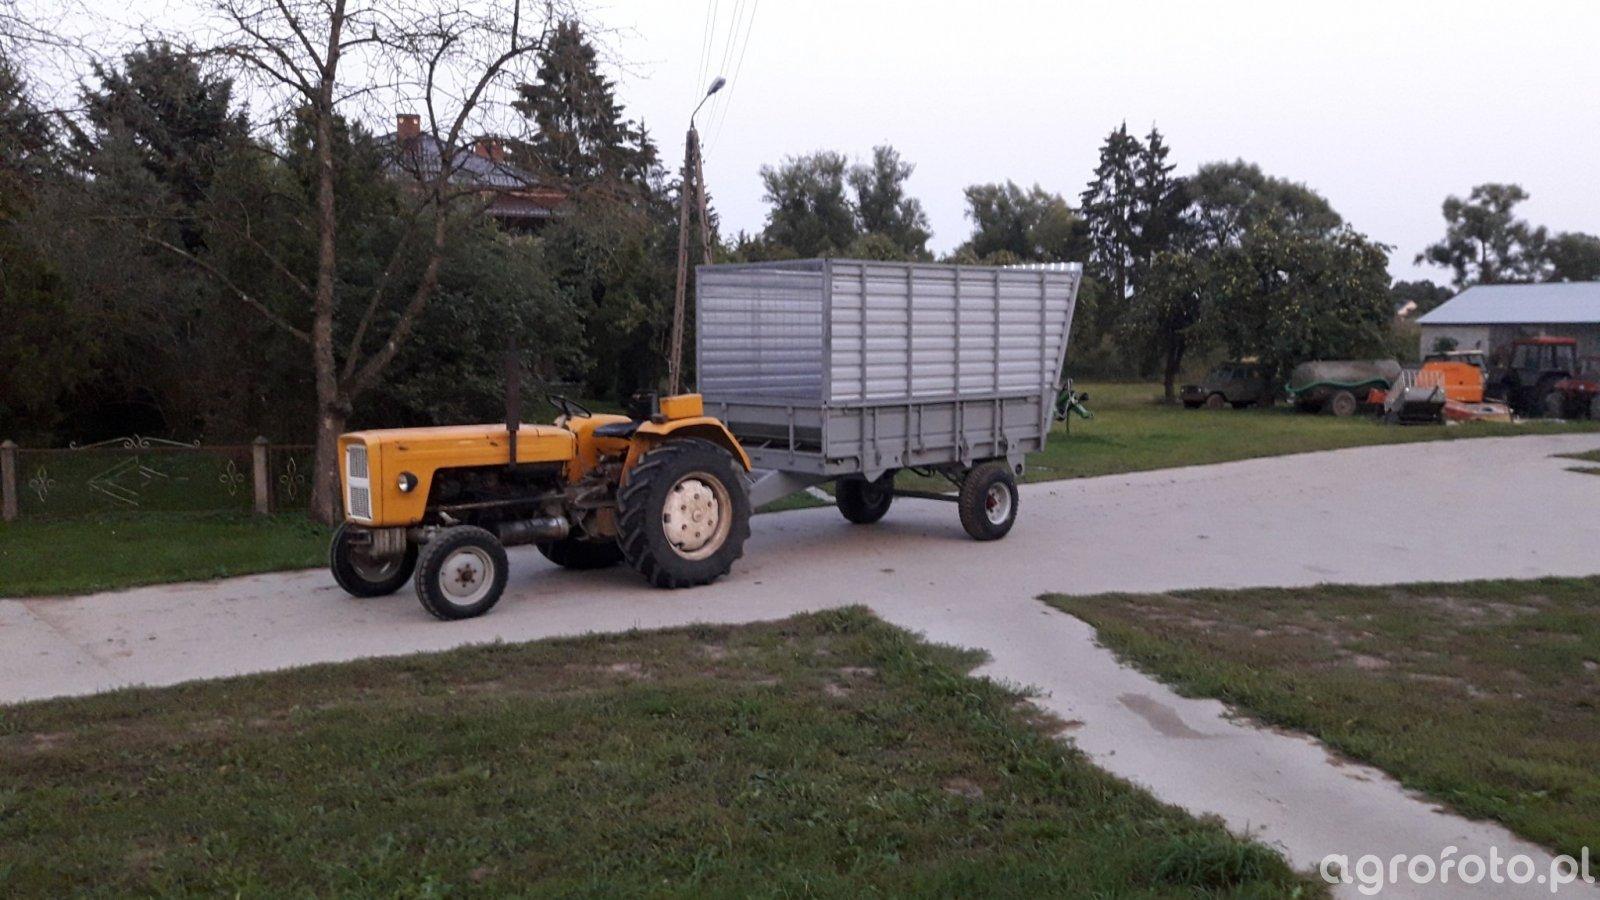 Ursus C-360 Wózek do kukurydzy